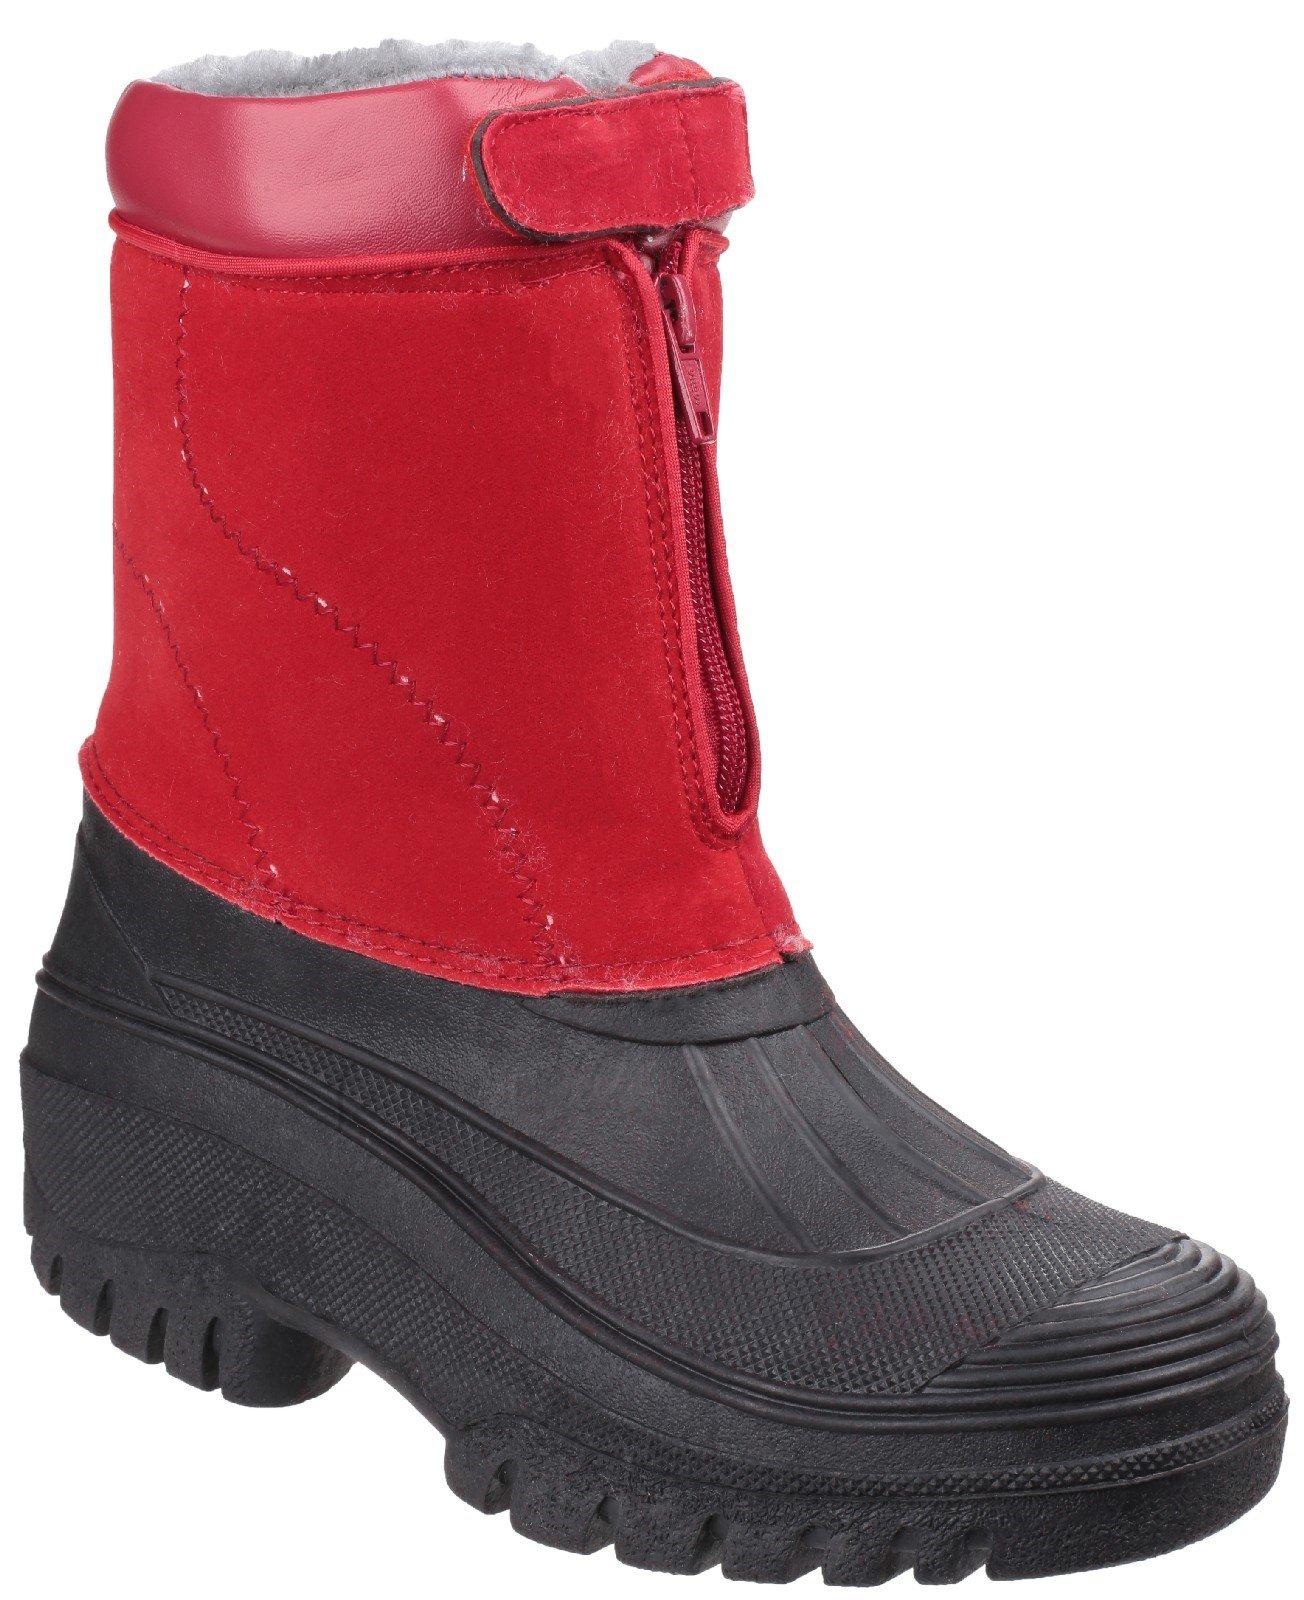 Cotswold Women's Venture Waterproof Winter Boot Various Colours 16569 - Red 2